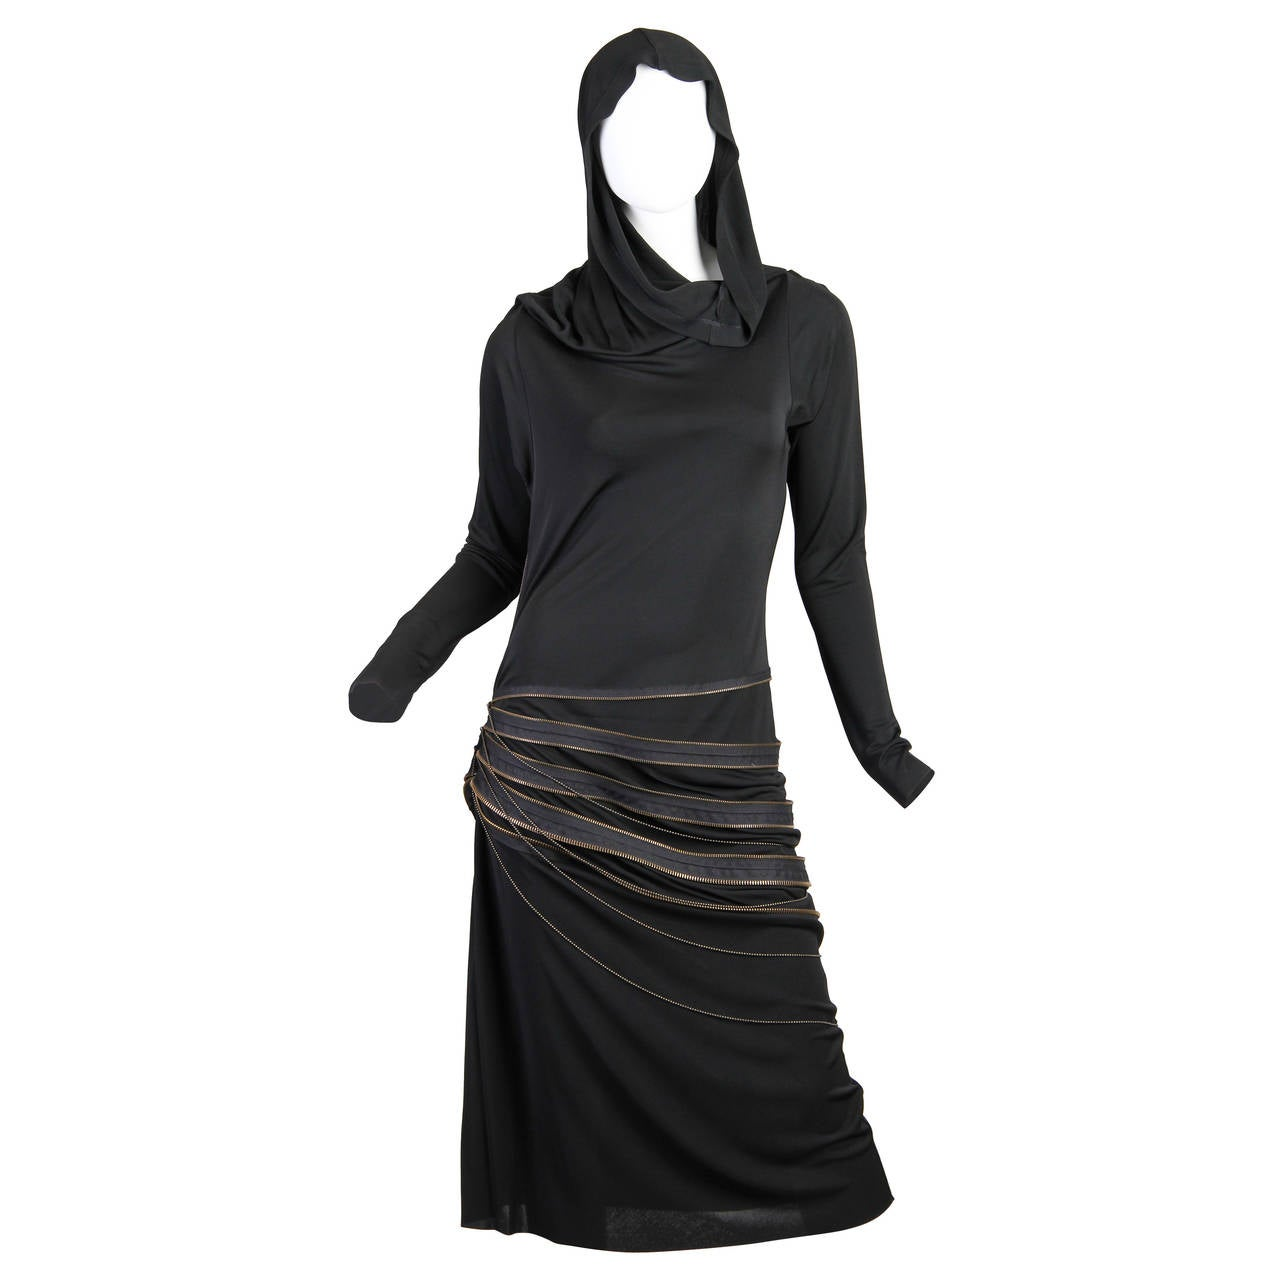 Jean Paul Gaultier Jersey Zipper Dress with Hood